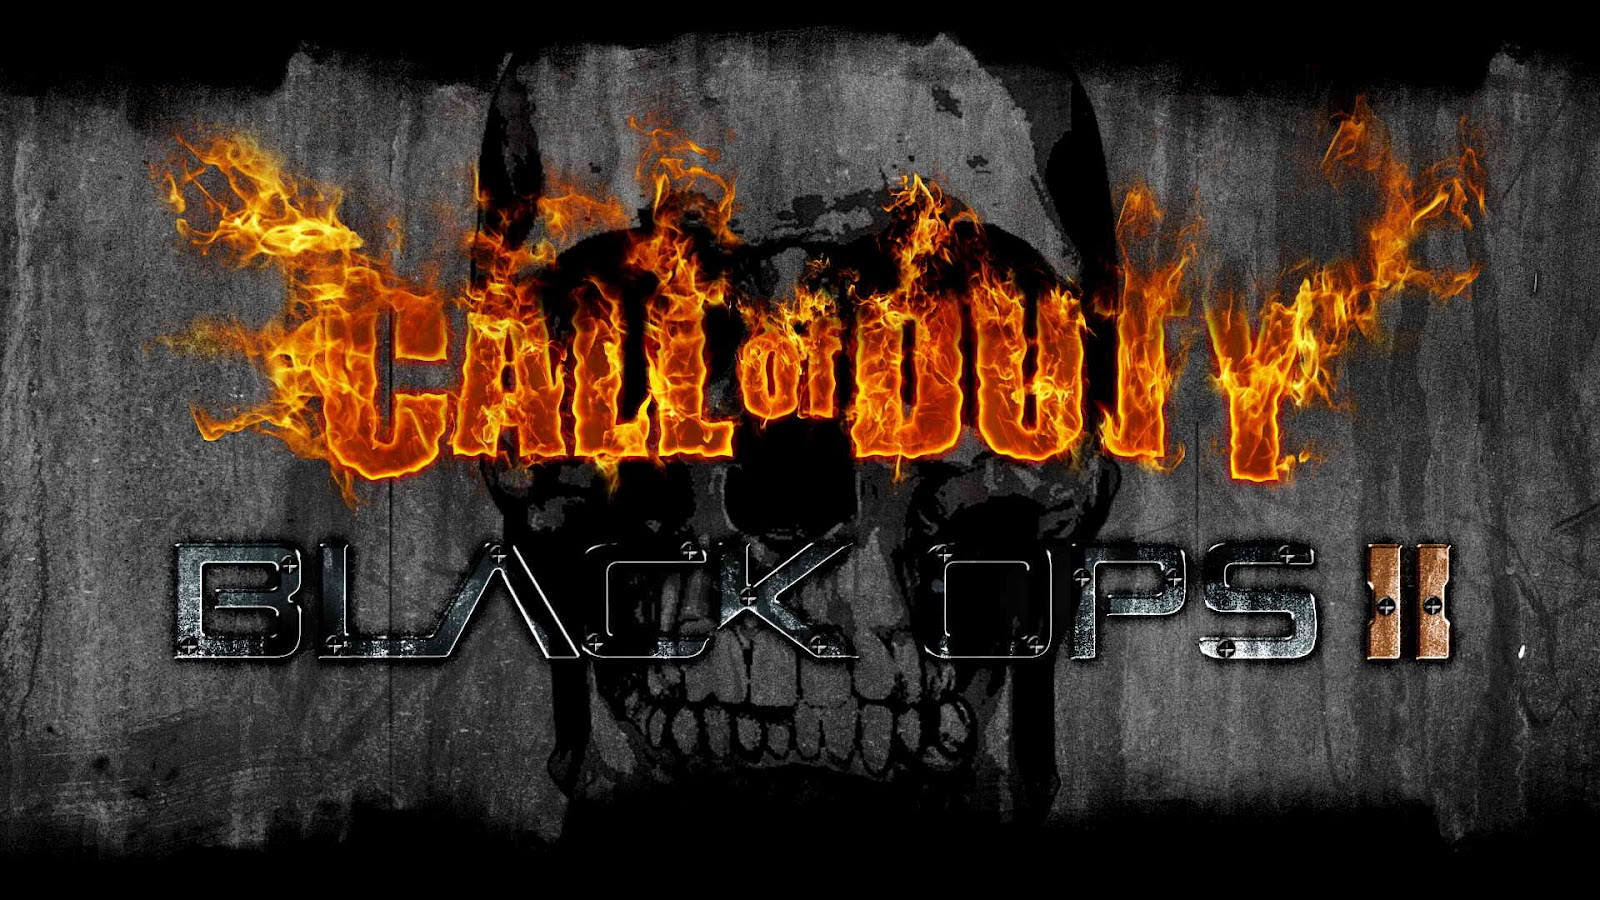 Call Of Duty Black Ops 2 Wallpaper 1600x900 67342